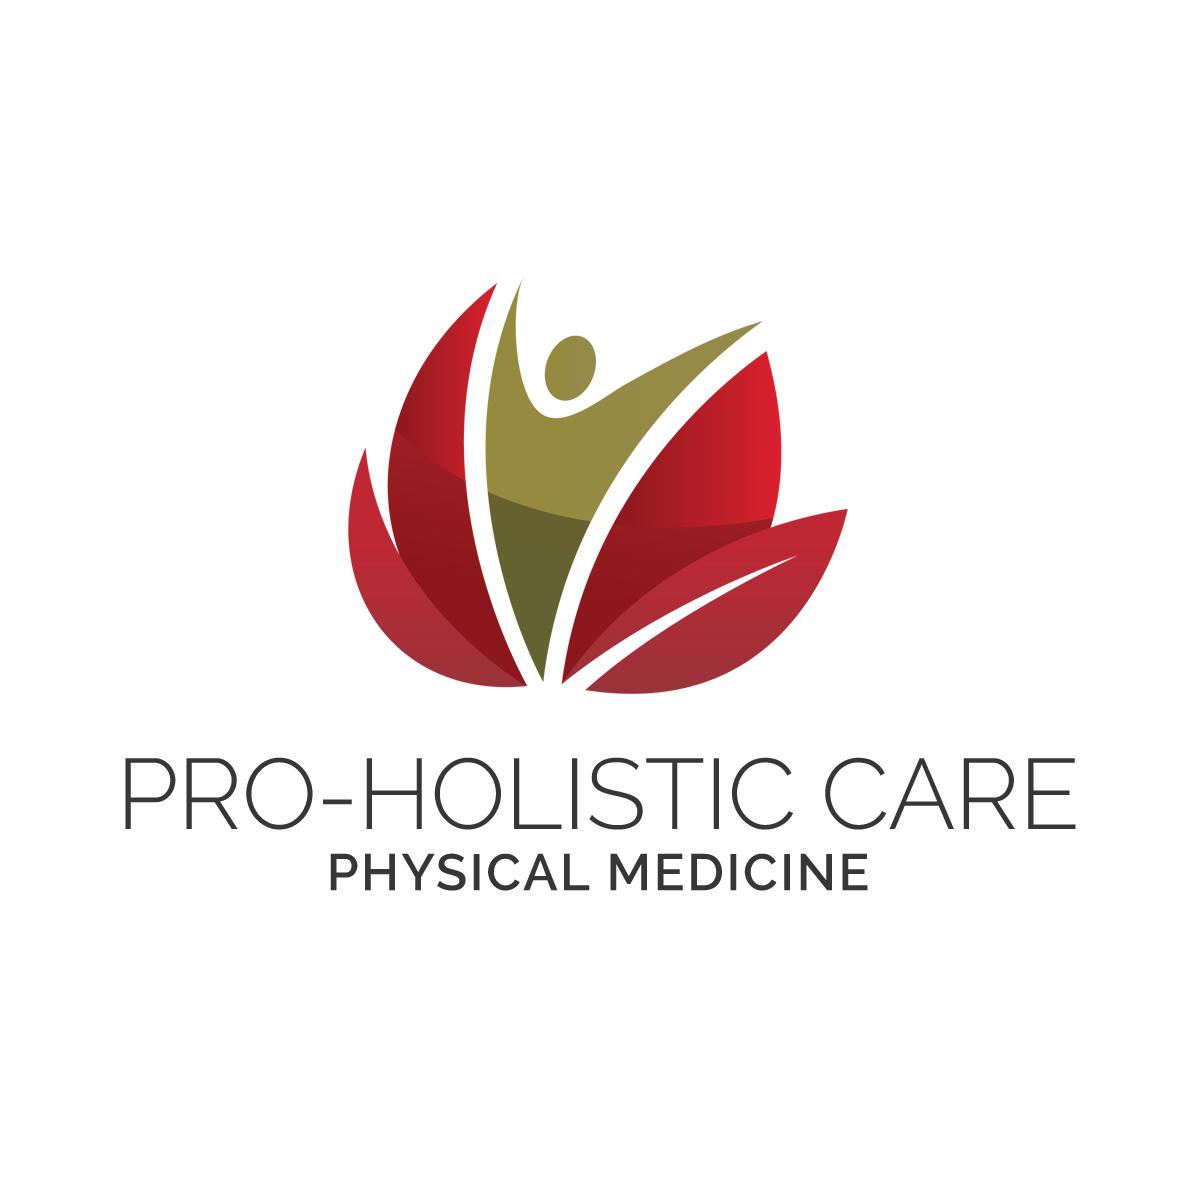 Pro-Holistic Care Physical Medicine